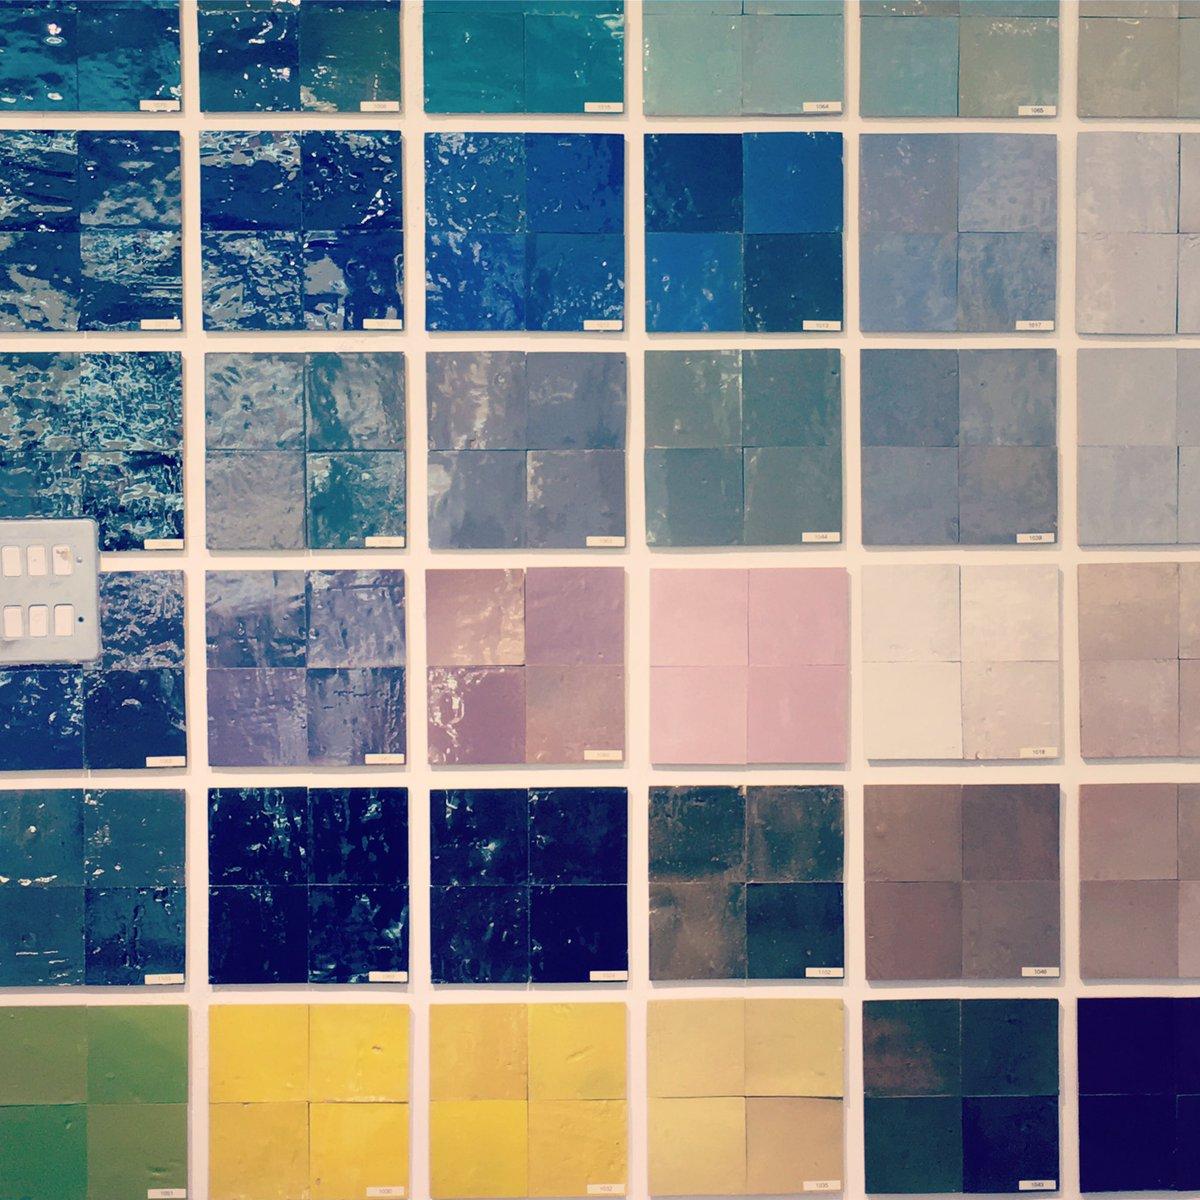 mosaic del sur mosaicdelsur twitter. Black Bedroom Furniture Sets. Home Design Ideas